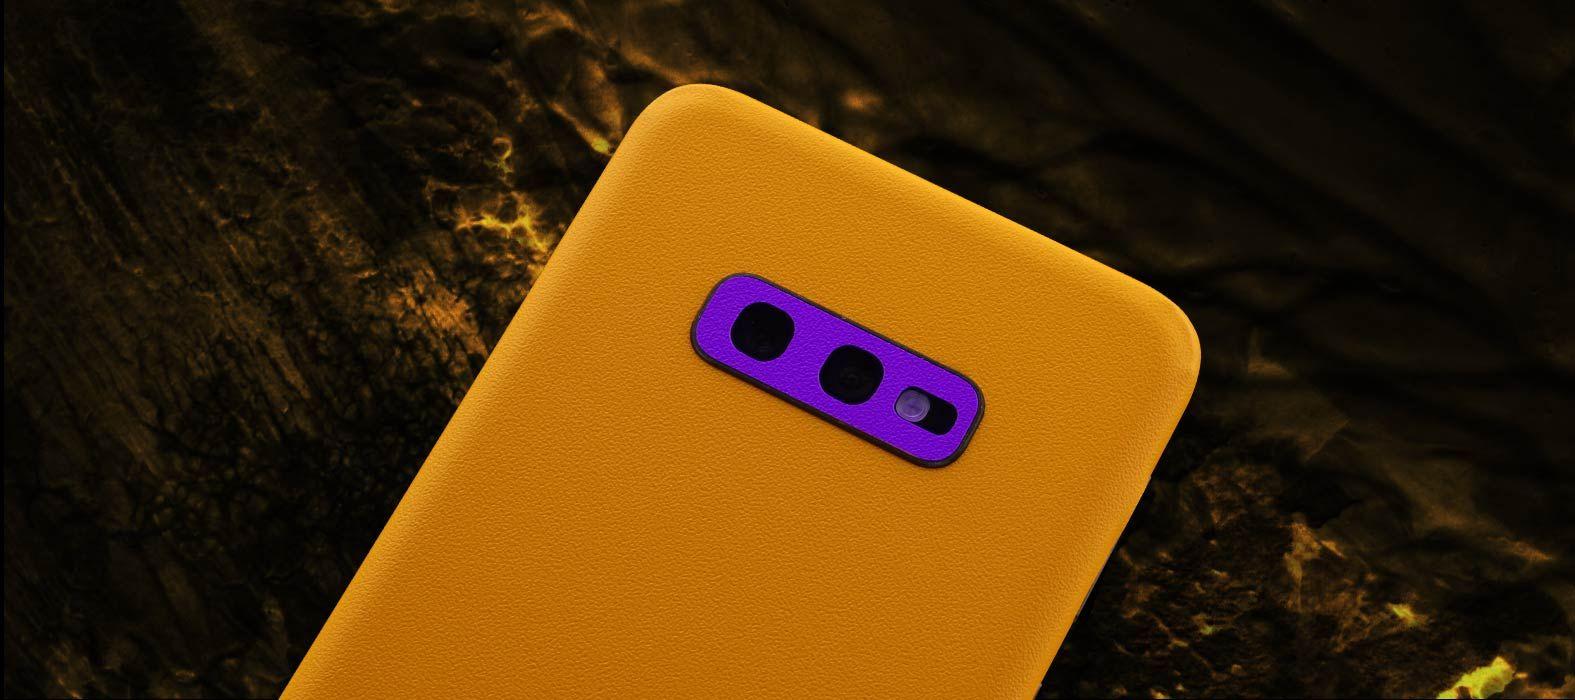 Galaxy S10e Sandstone yellow skins